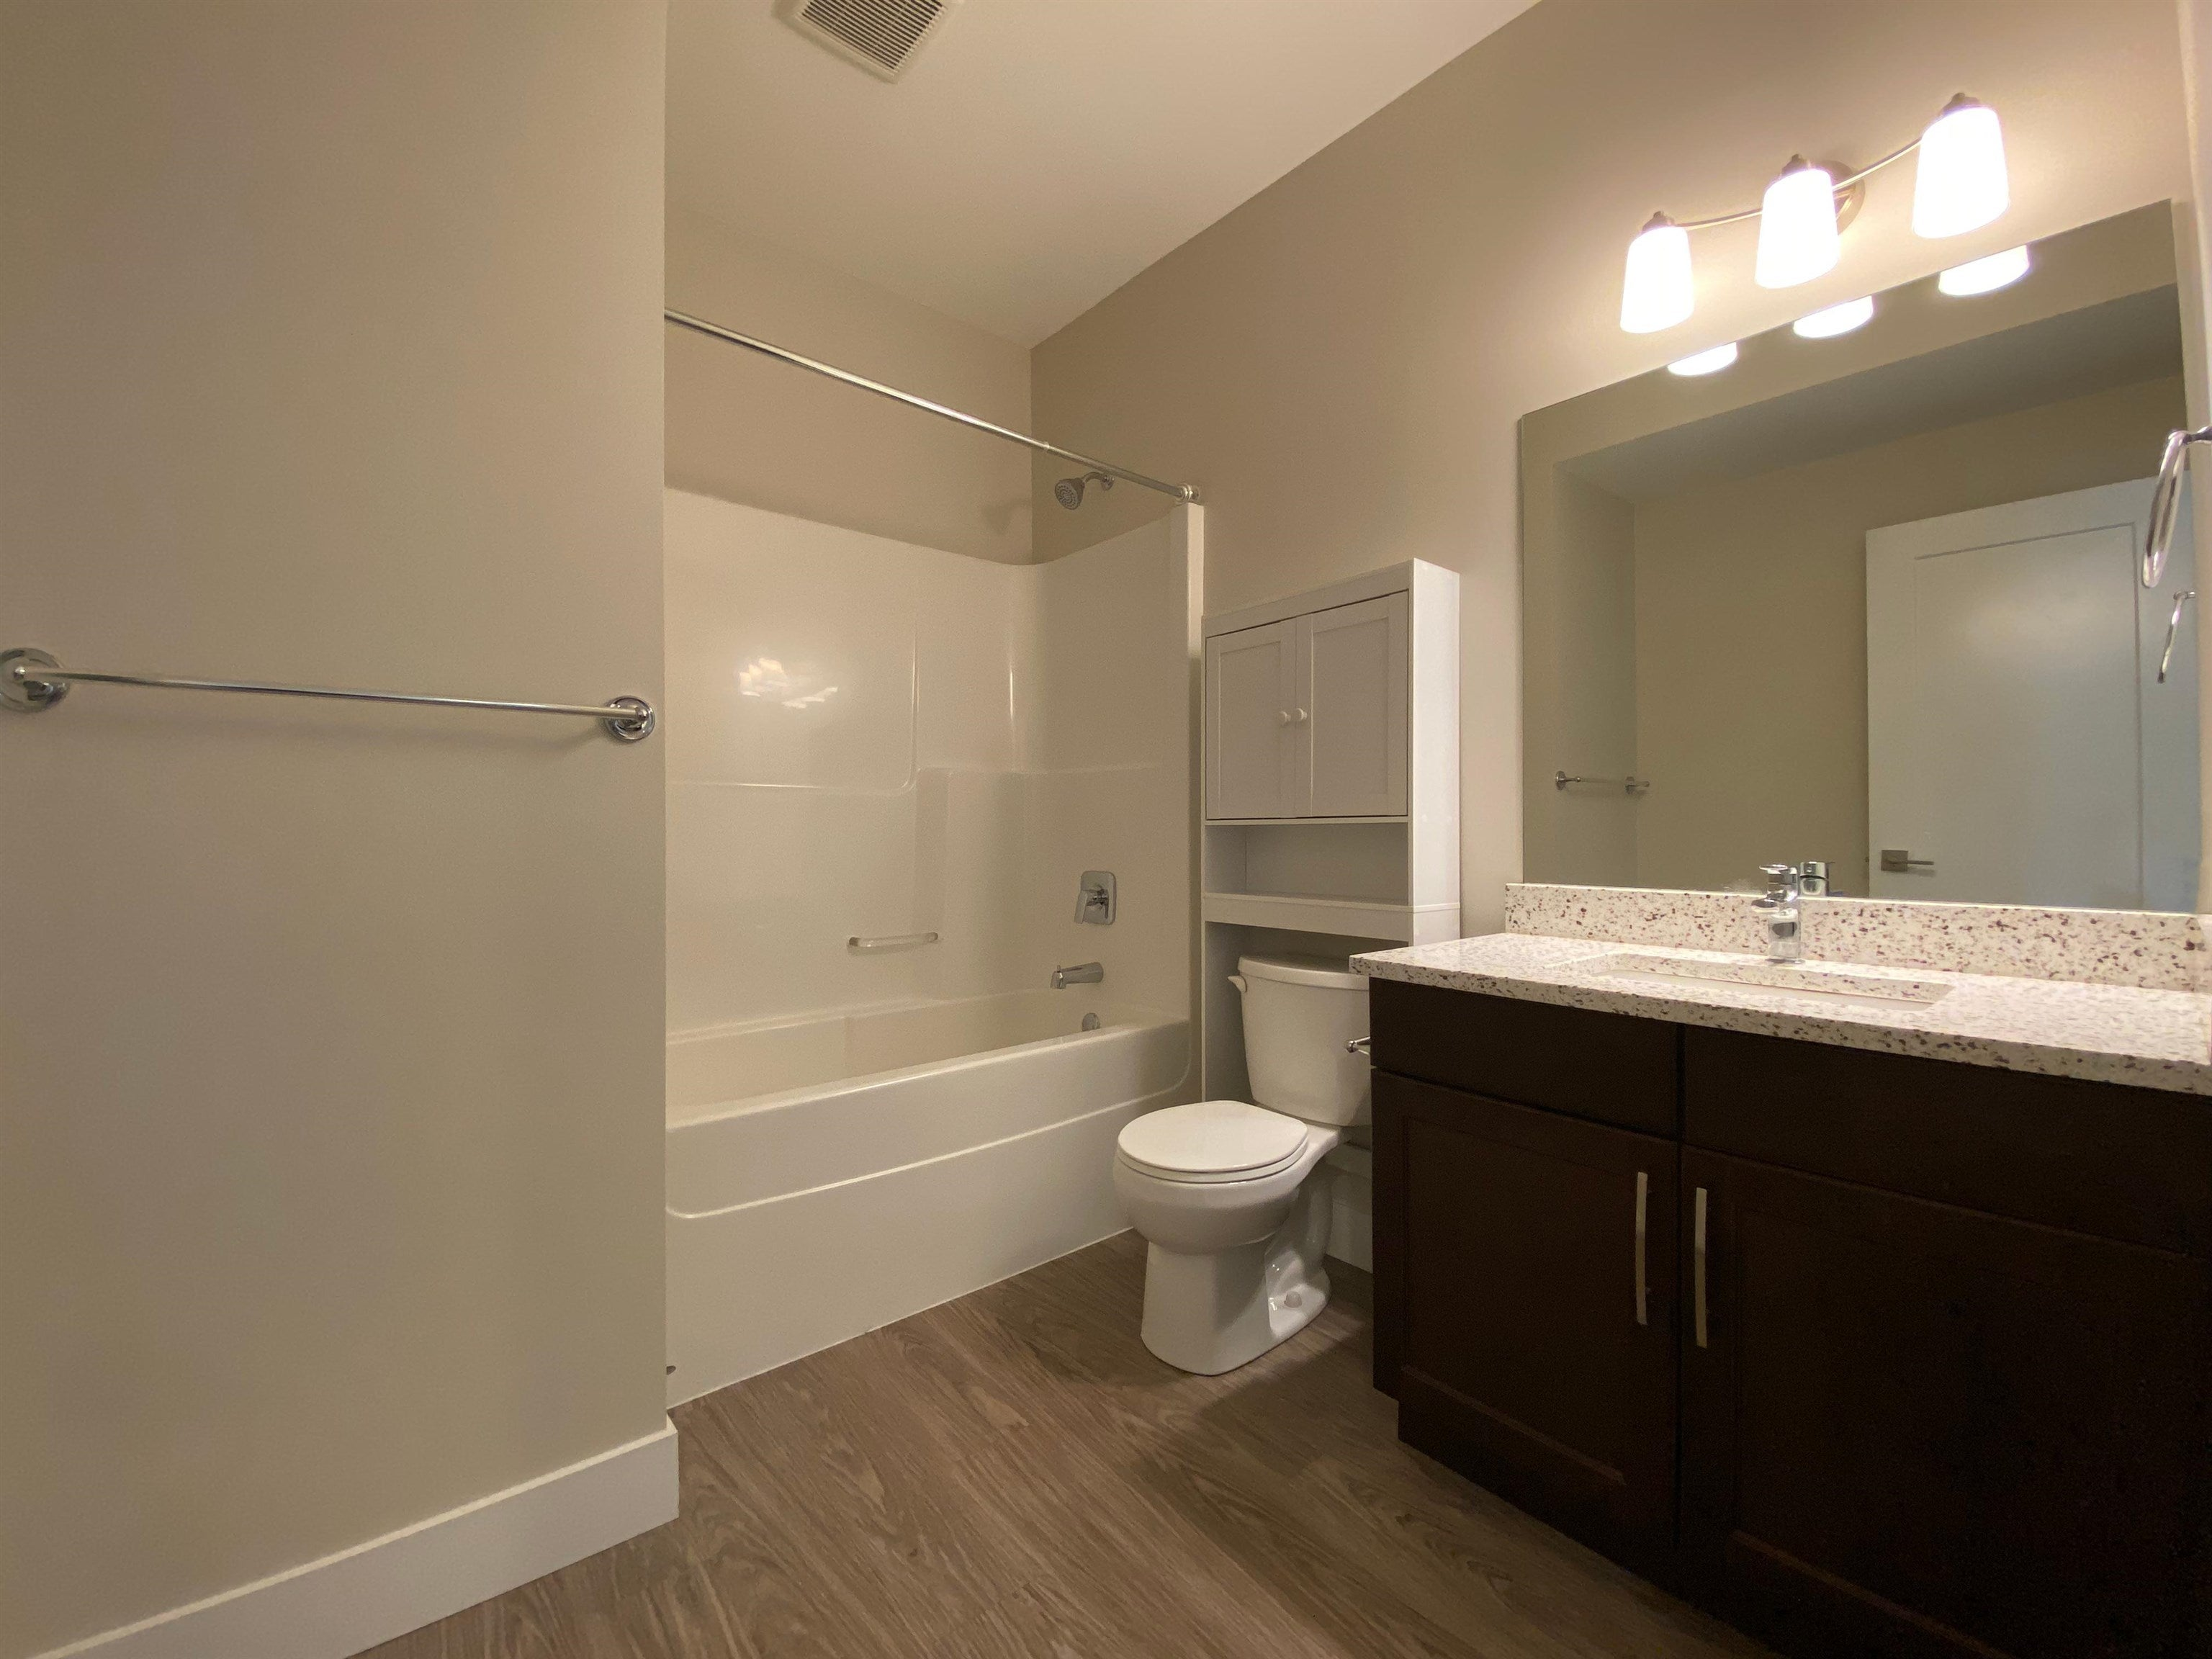 10144 KILLARNEY DRIVE - Fairfield Island House/Single Family for sale, 5 Bedrooms (R2625716) - #30